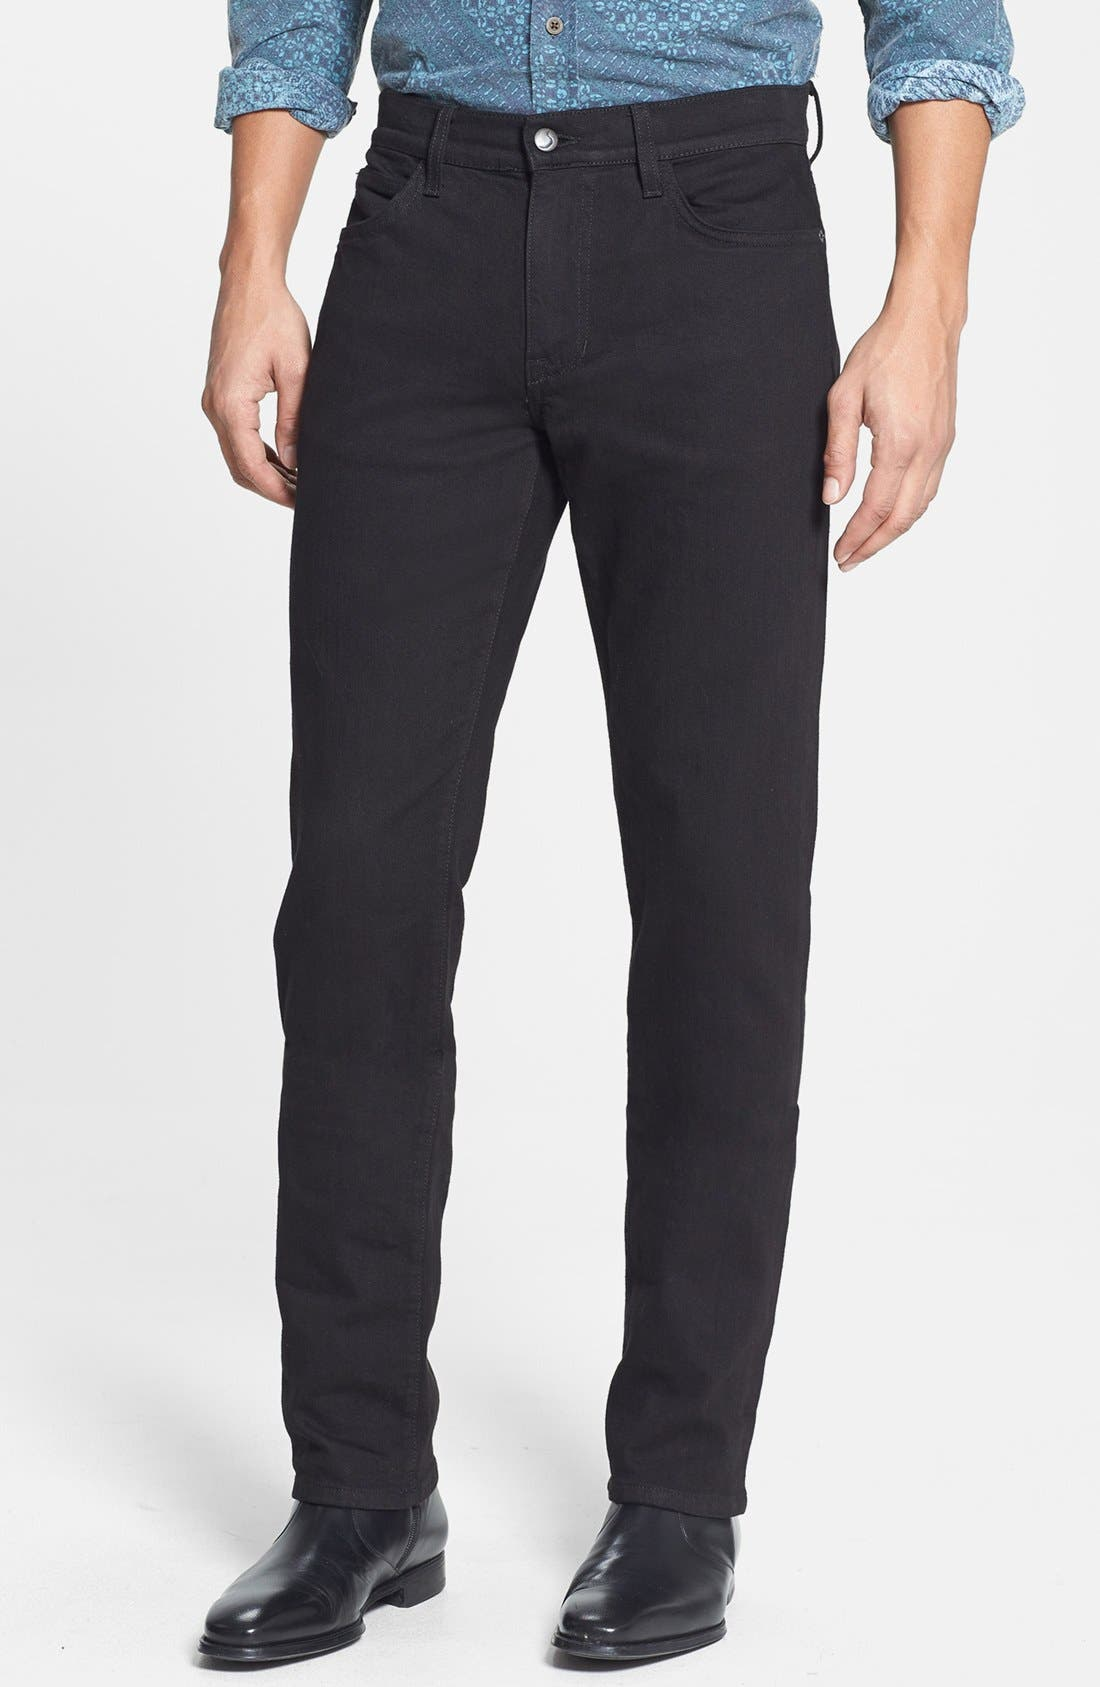 Main Image - Joe's 'Brixton' Slim Fit Jeans (Jet Black)